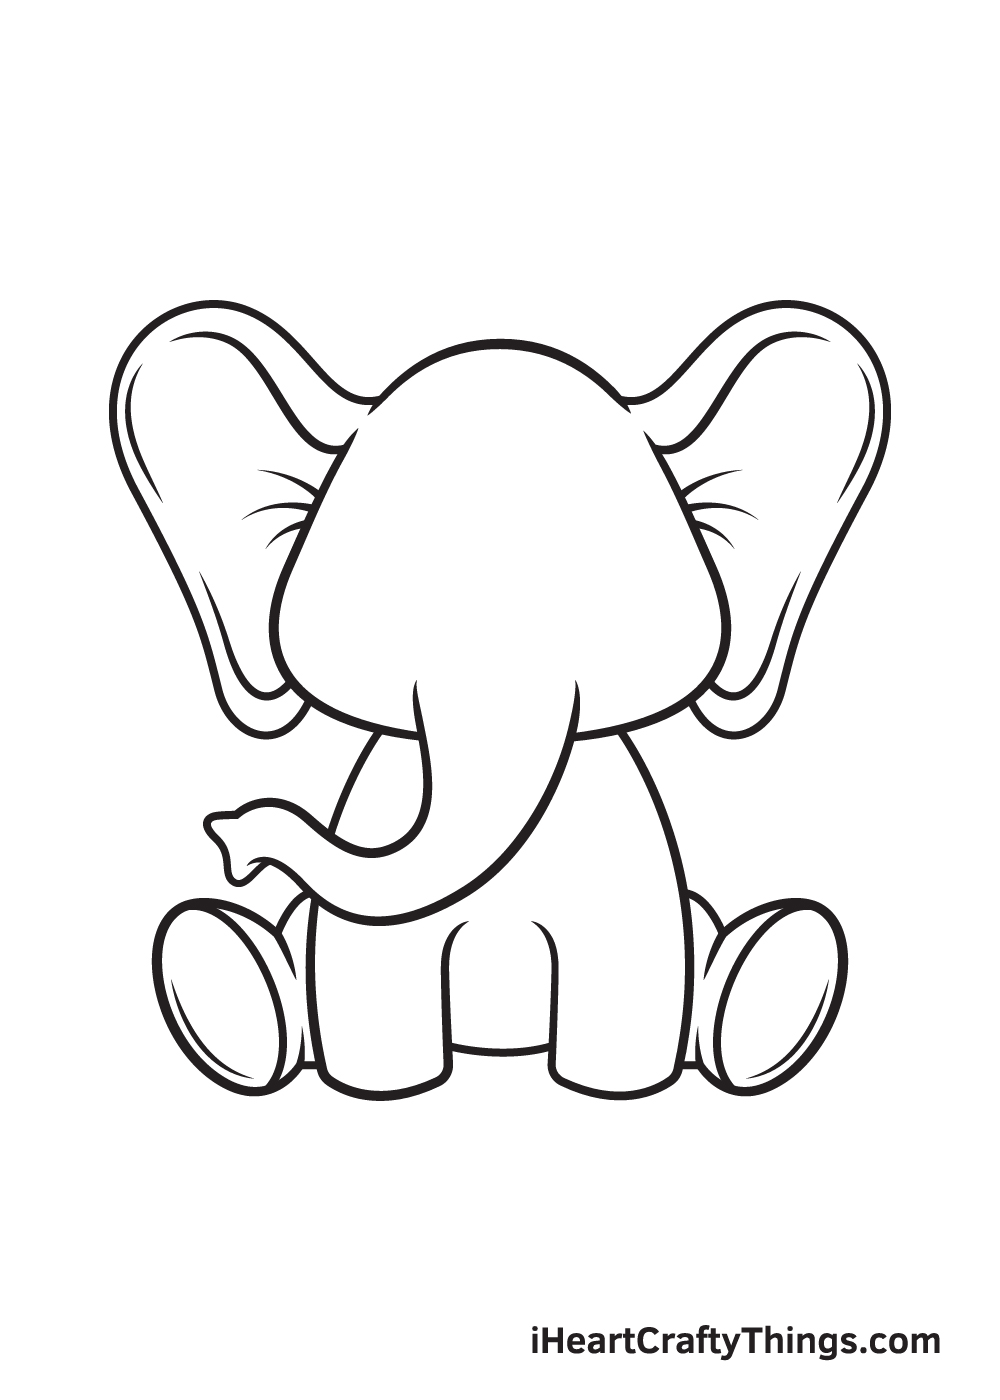 Vẽ con voi - Bước 8